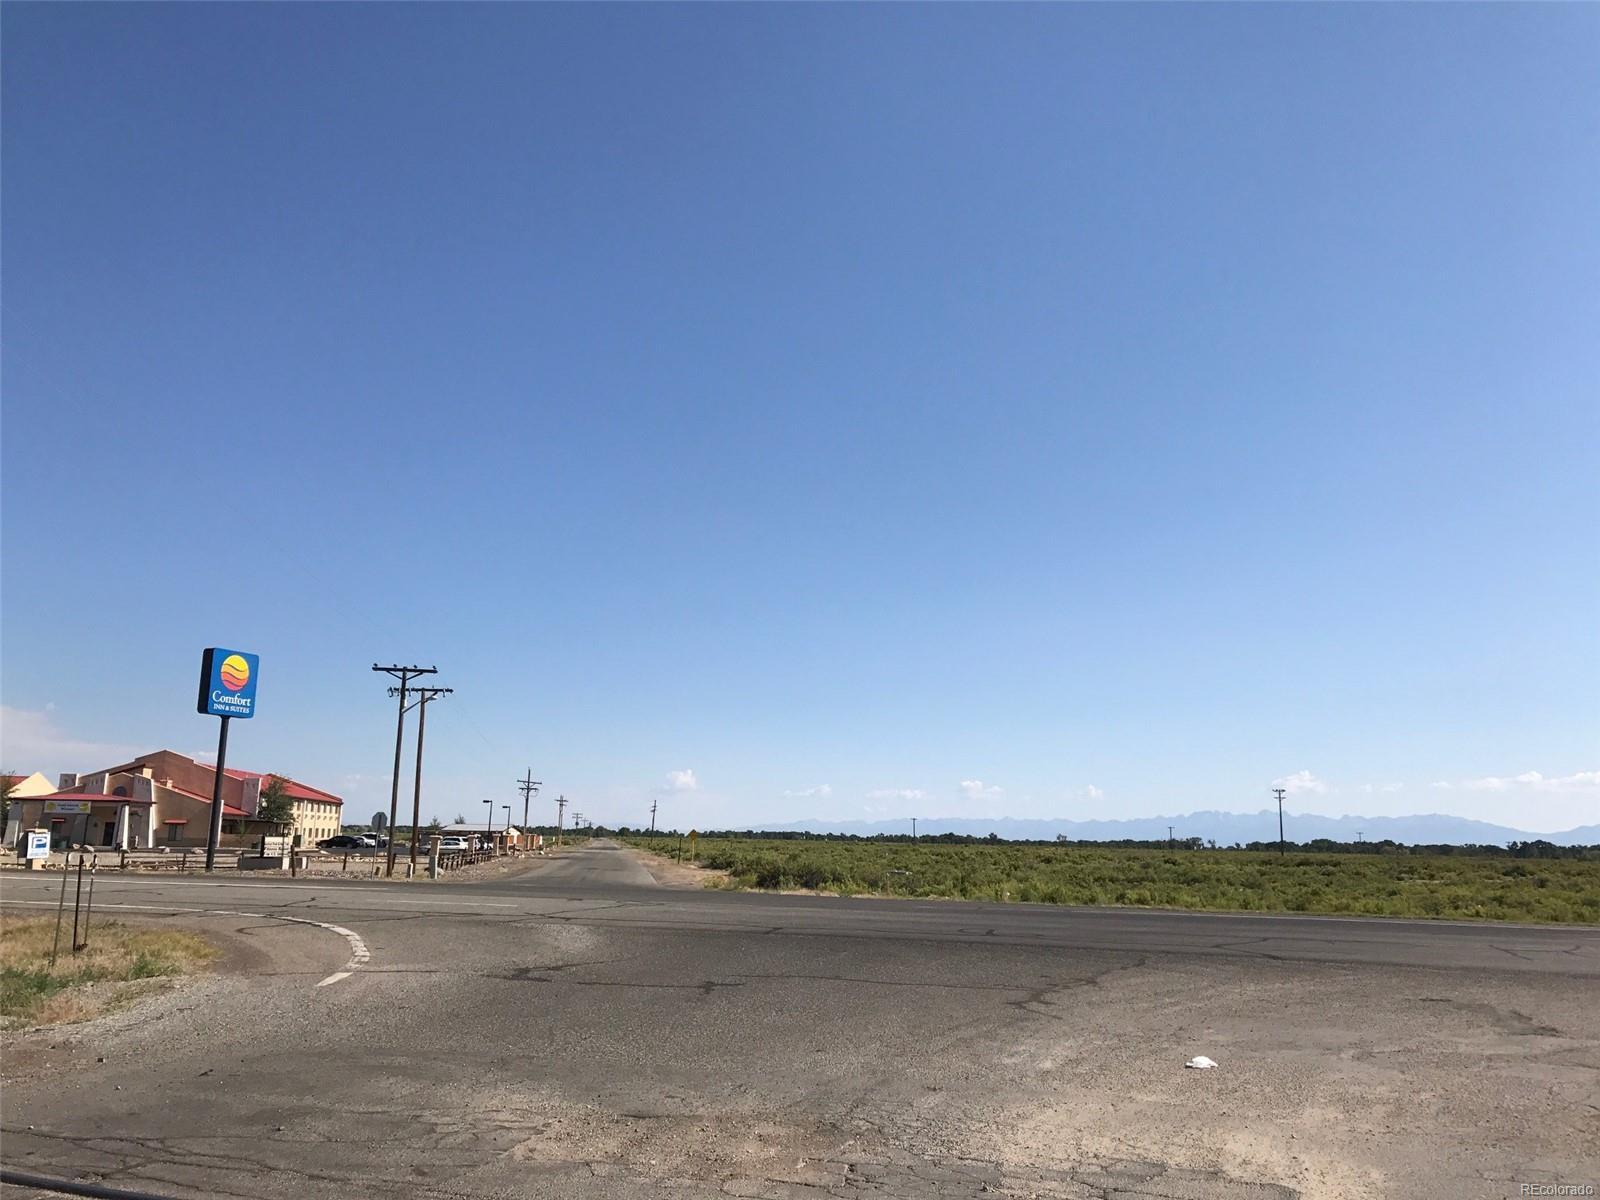 0000 So. Cty Rd 107, Alamosa, CO 81101 - Alamosa, CO real estate listing